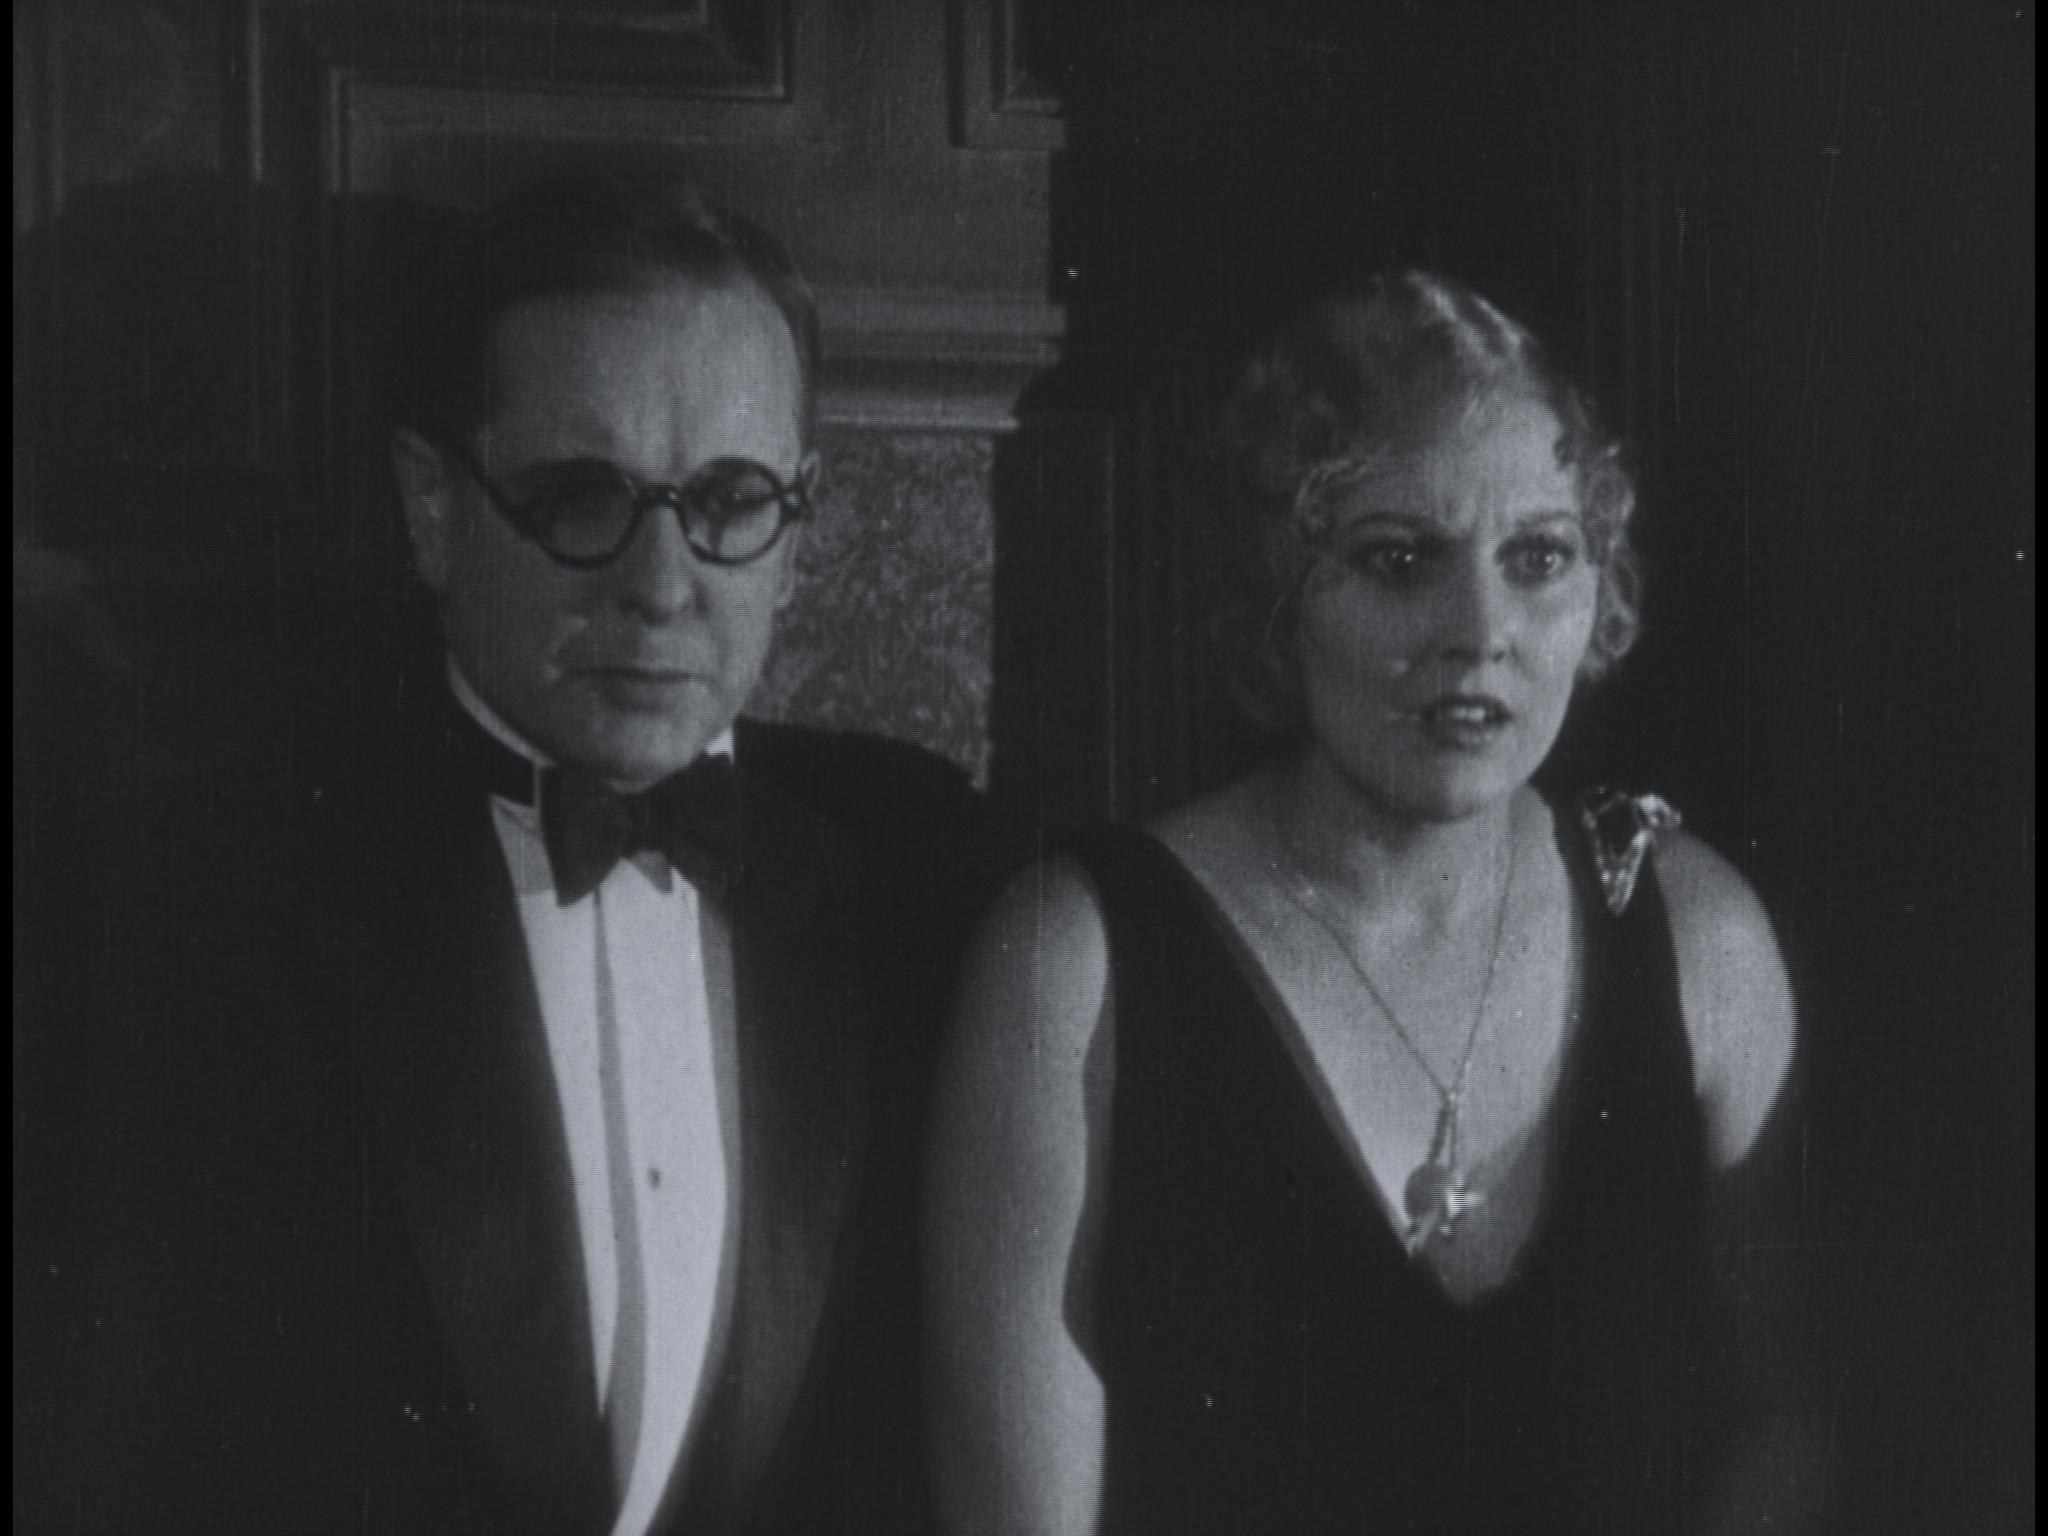 SEVEN FOOTPRINTS TO SATAN (US 1929) Credit: Cineteca Italiana, Milano